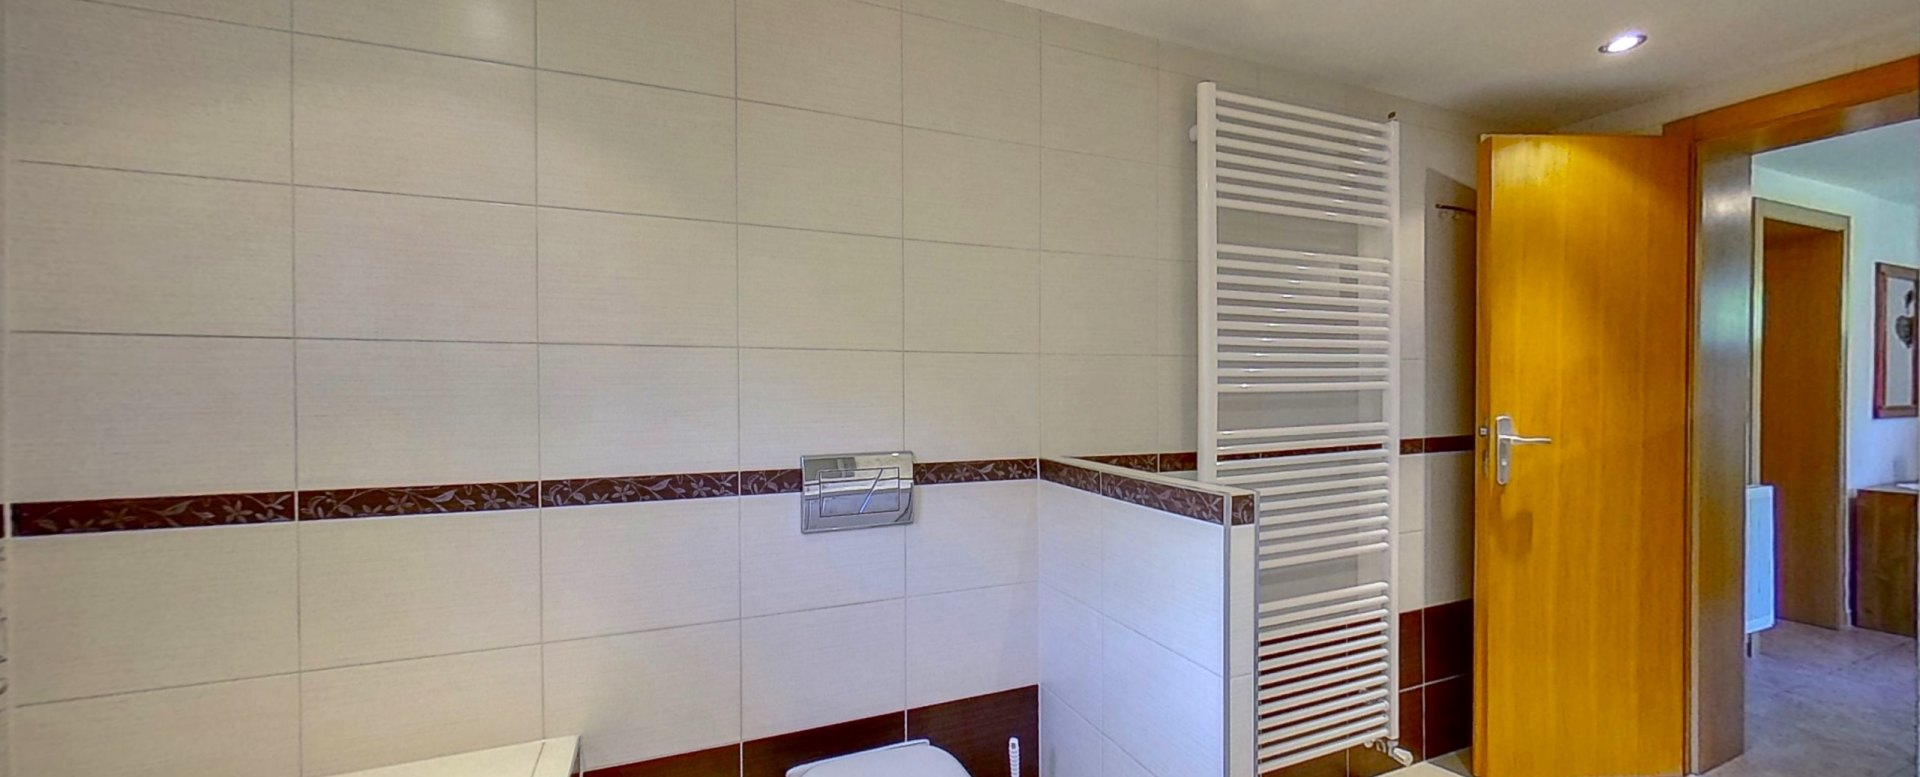 Kúpeľňa s vaňou a toaletou